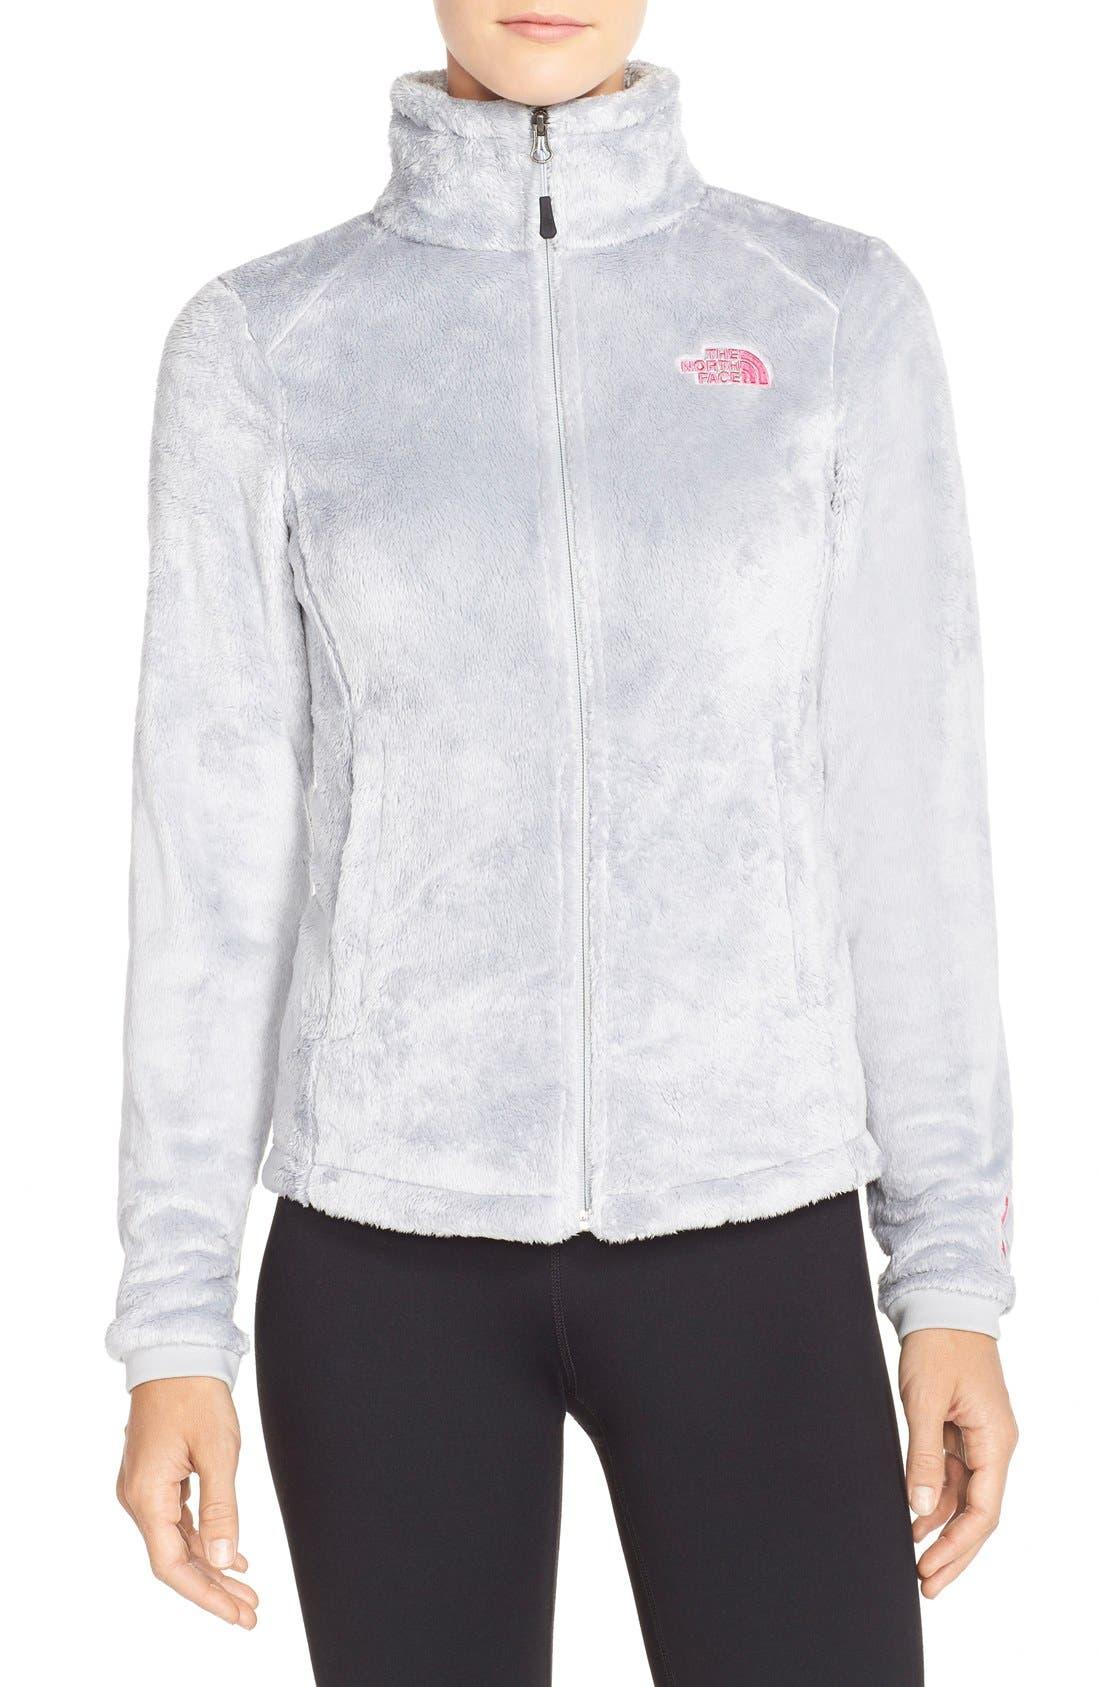 THE NORTH FACE 'Osito 2 - Pink Ribbon' Fleece Jacket, Main, color, 030